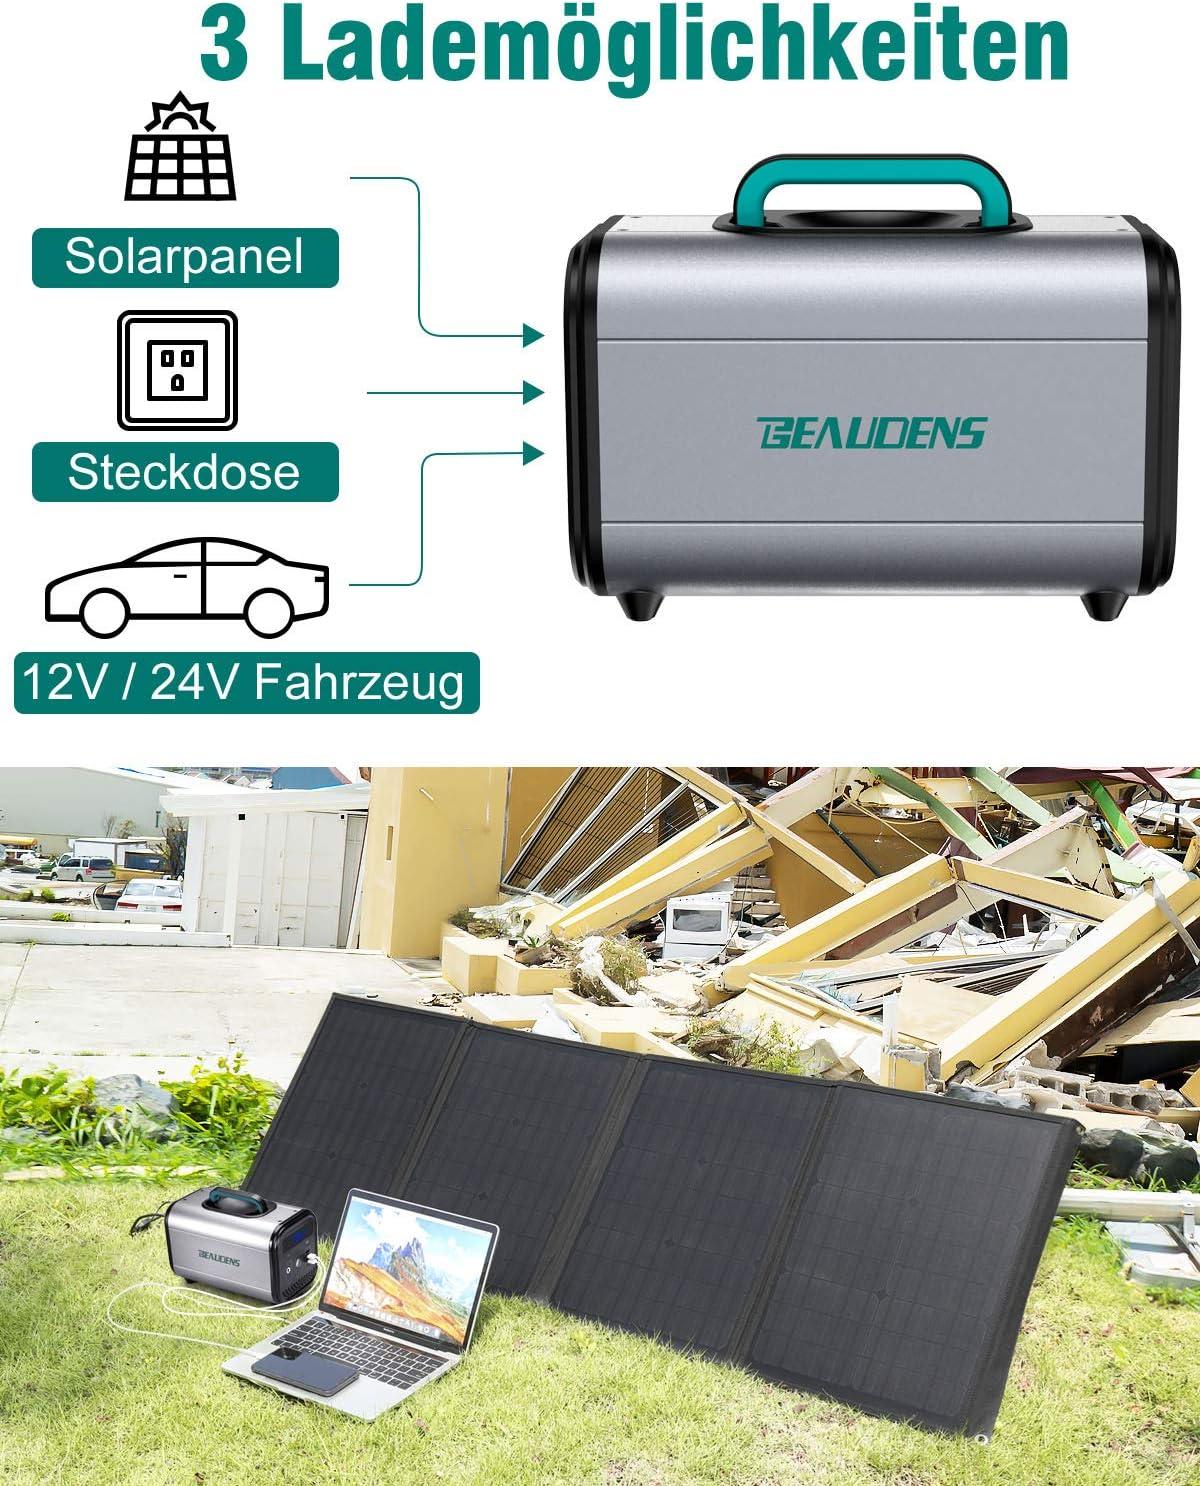 BEAUDENS Tragbare Power Station 166Wh 52000mAh 230V AC 2 DC-Port und 3 USB Anschl/üsse f/ür Reise Camping Emergency Akku Generator mit Lithium-Eisen-Phosphat-Batterie